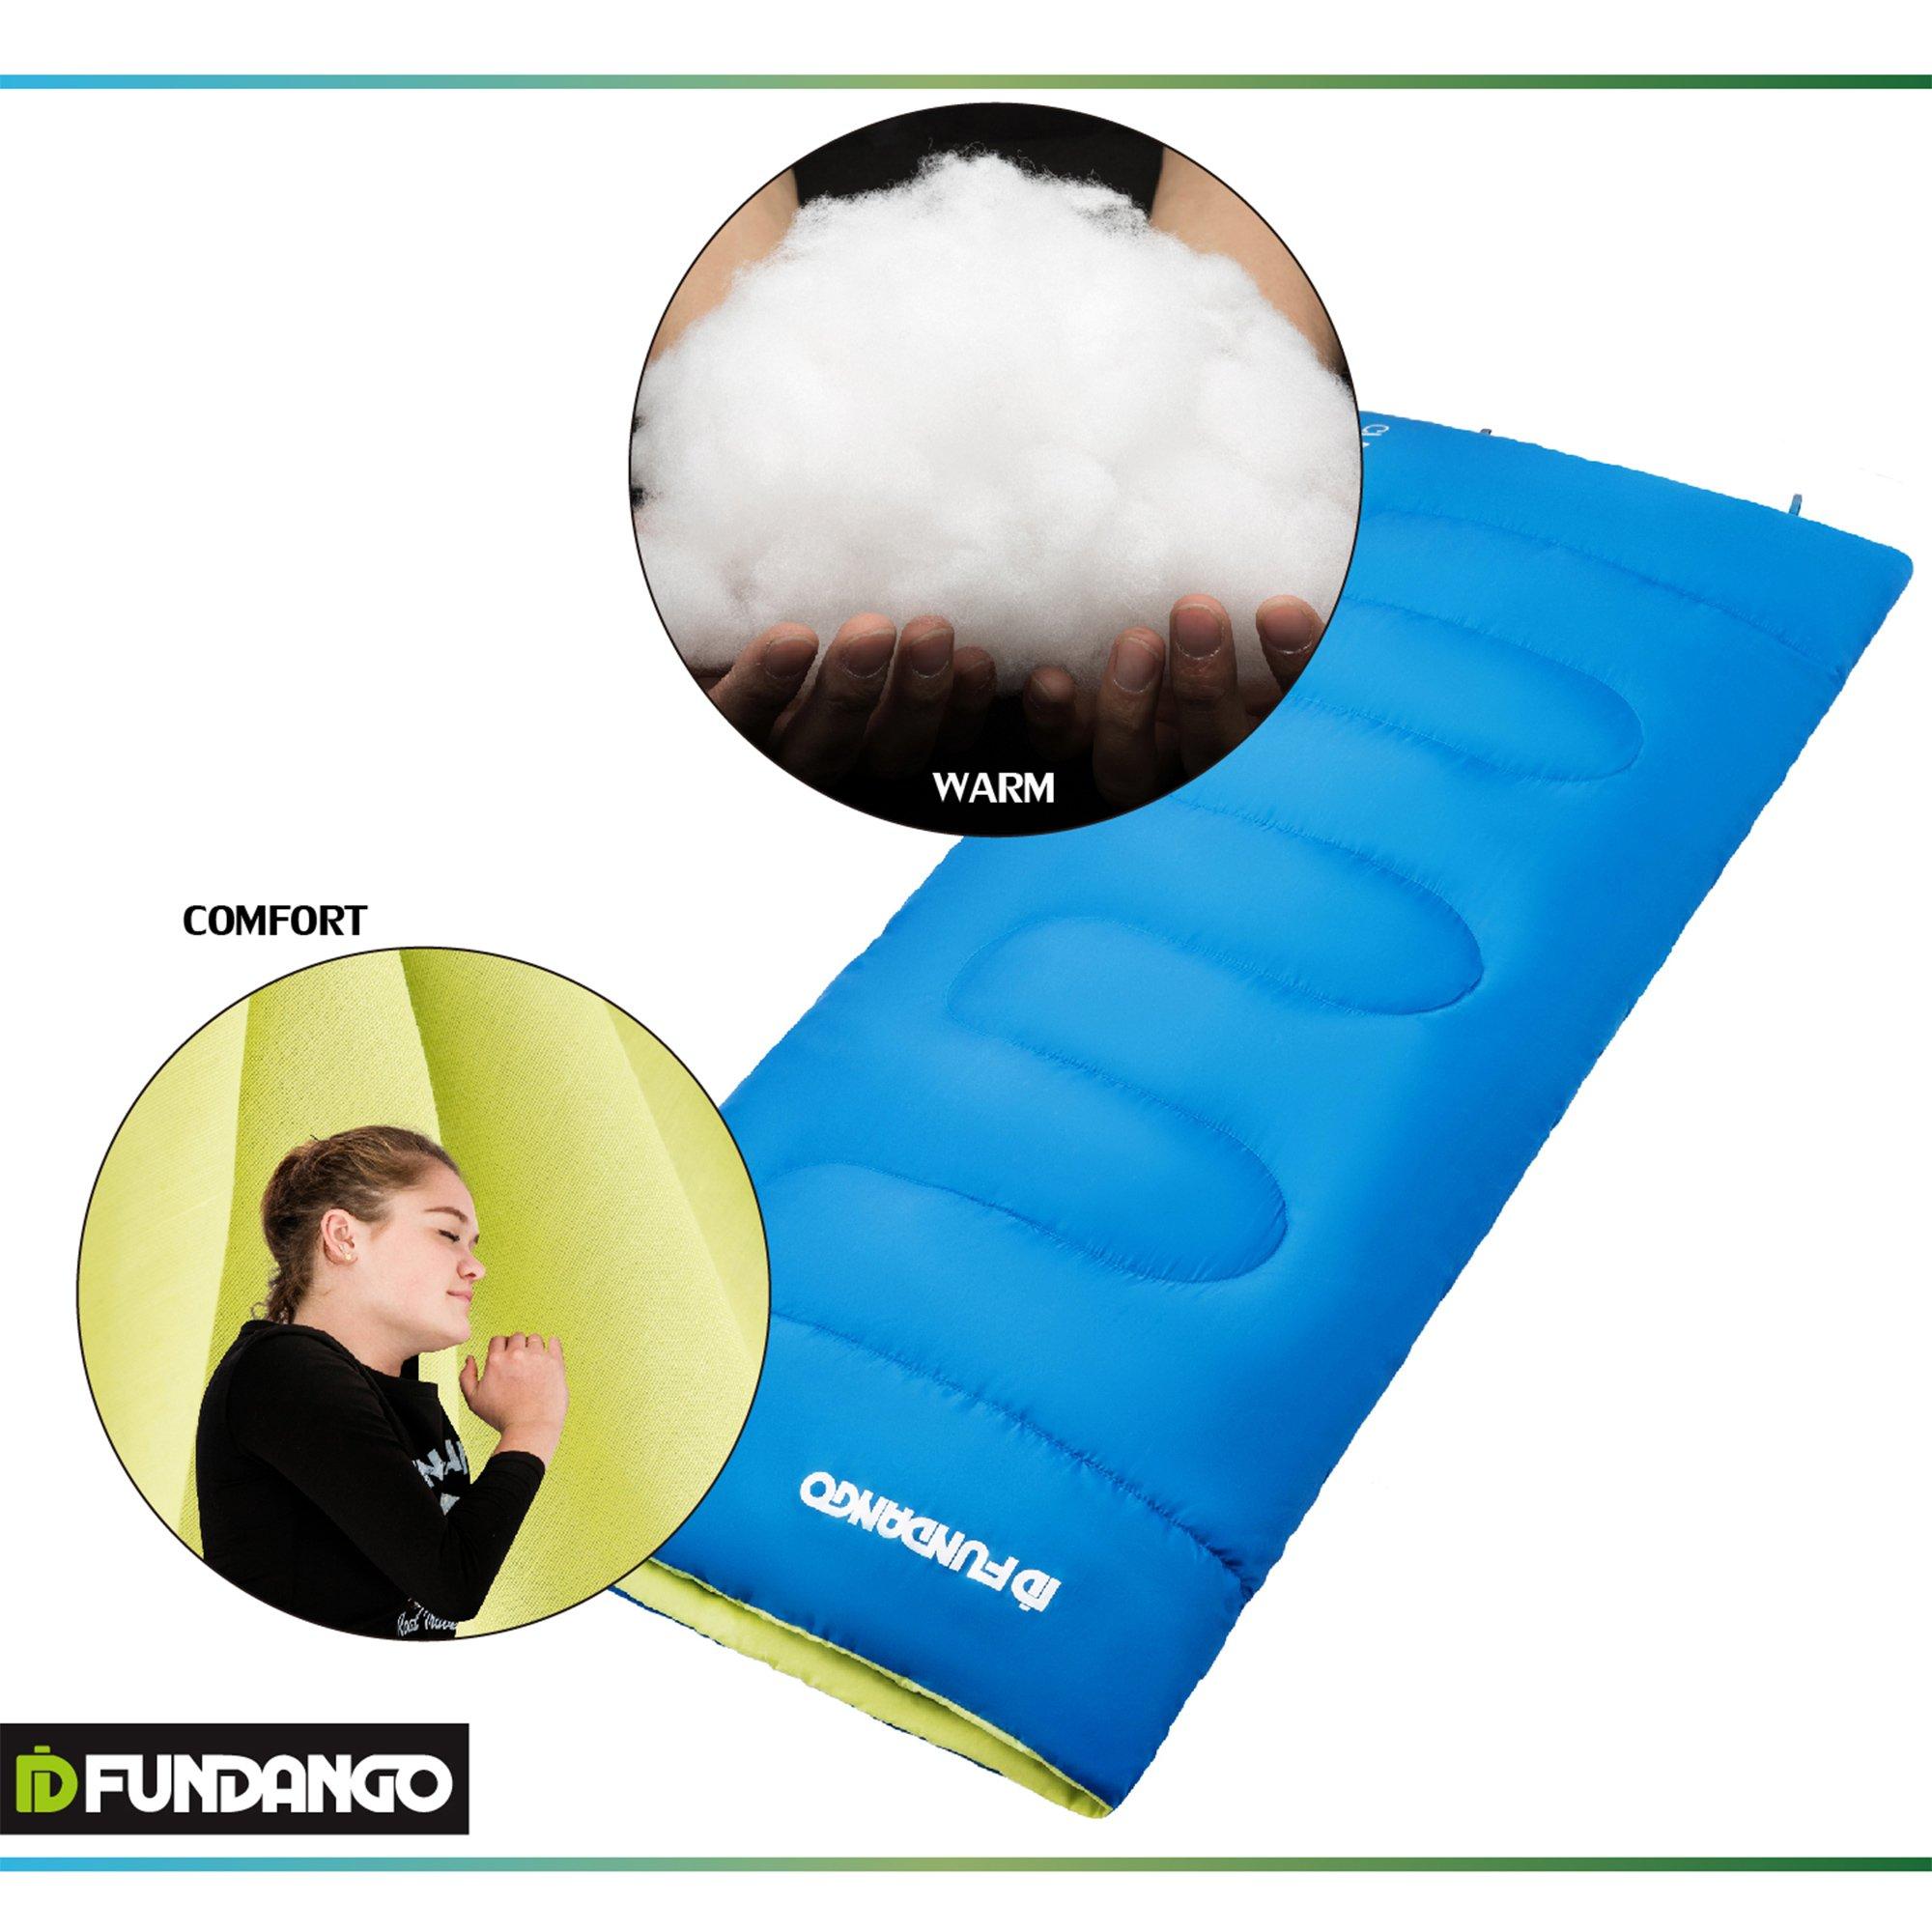 FUNDANGO Envelope Adult Sleeping Bag 37 Degree F/ 55.4 Degree F Lightweight with Compressed Sack